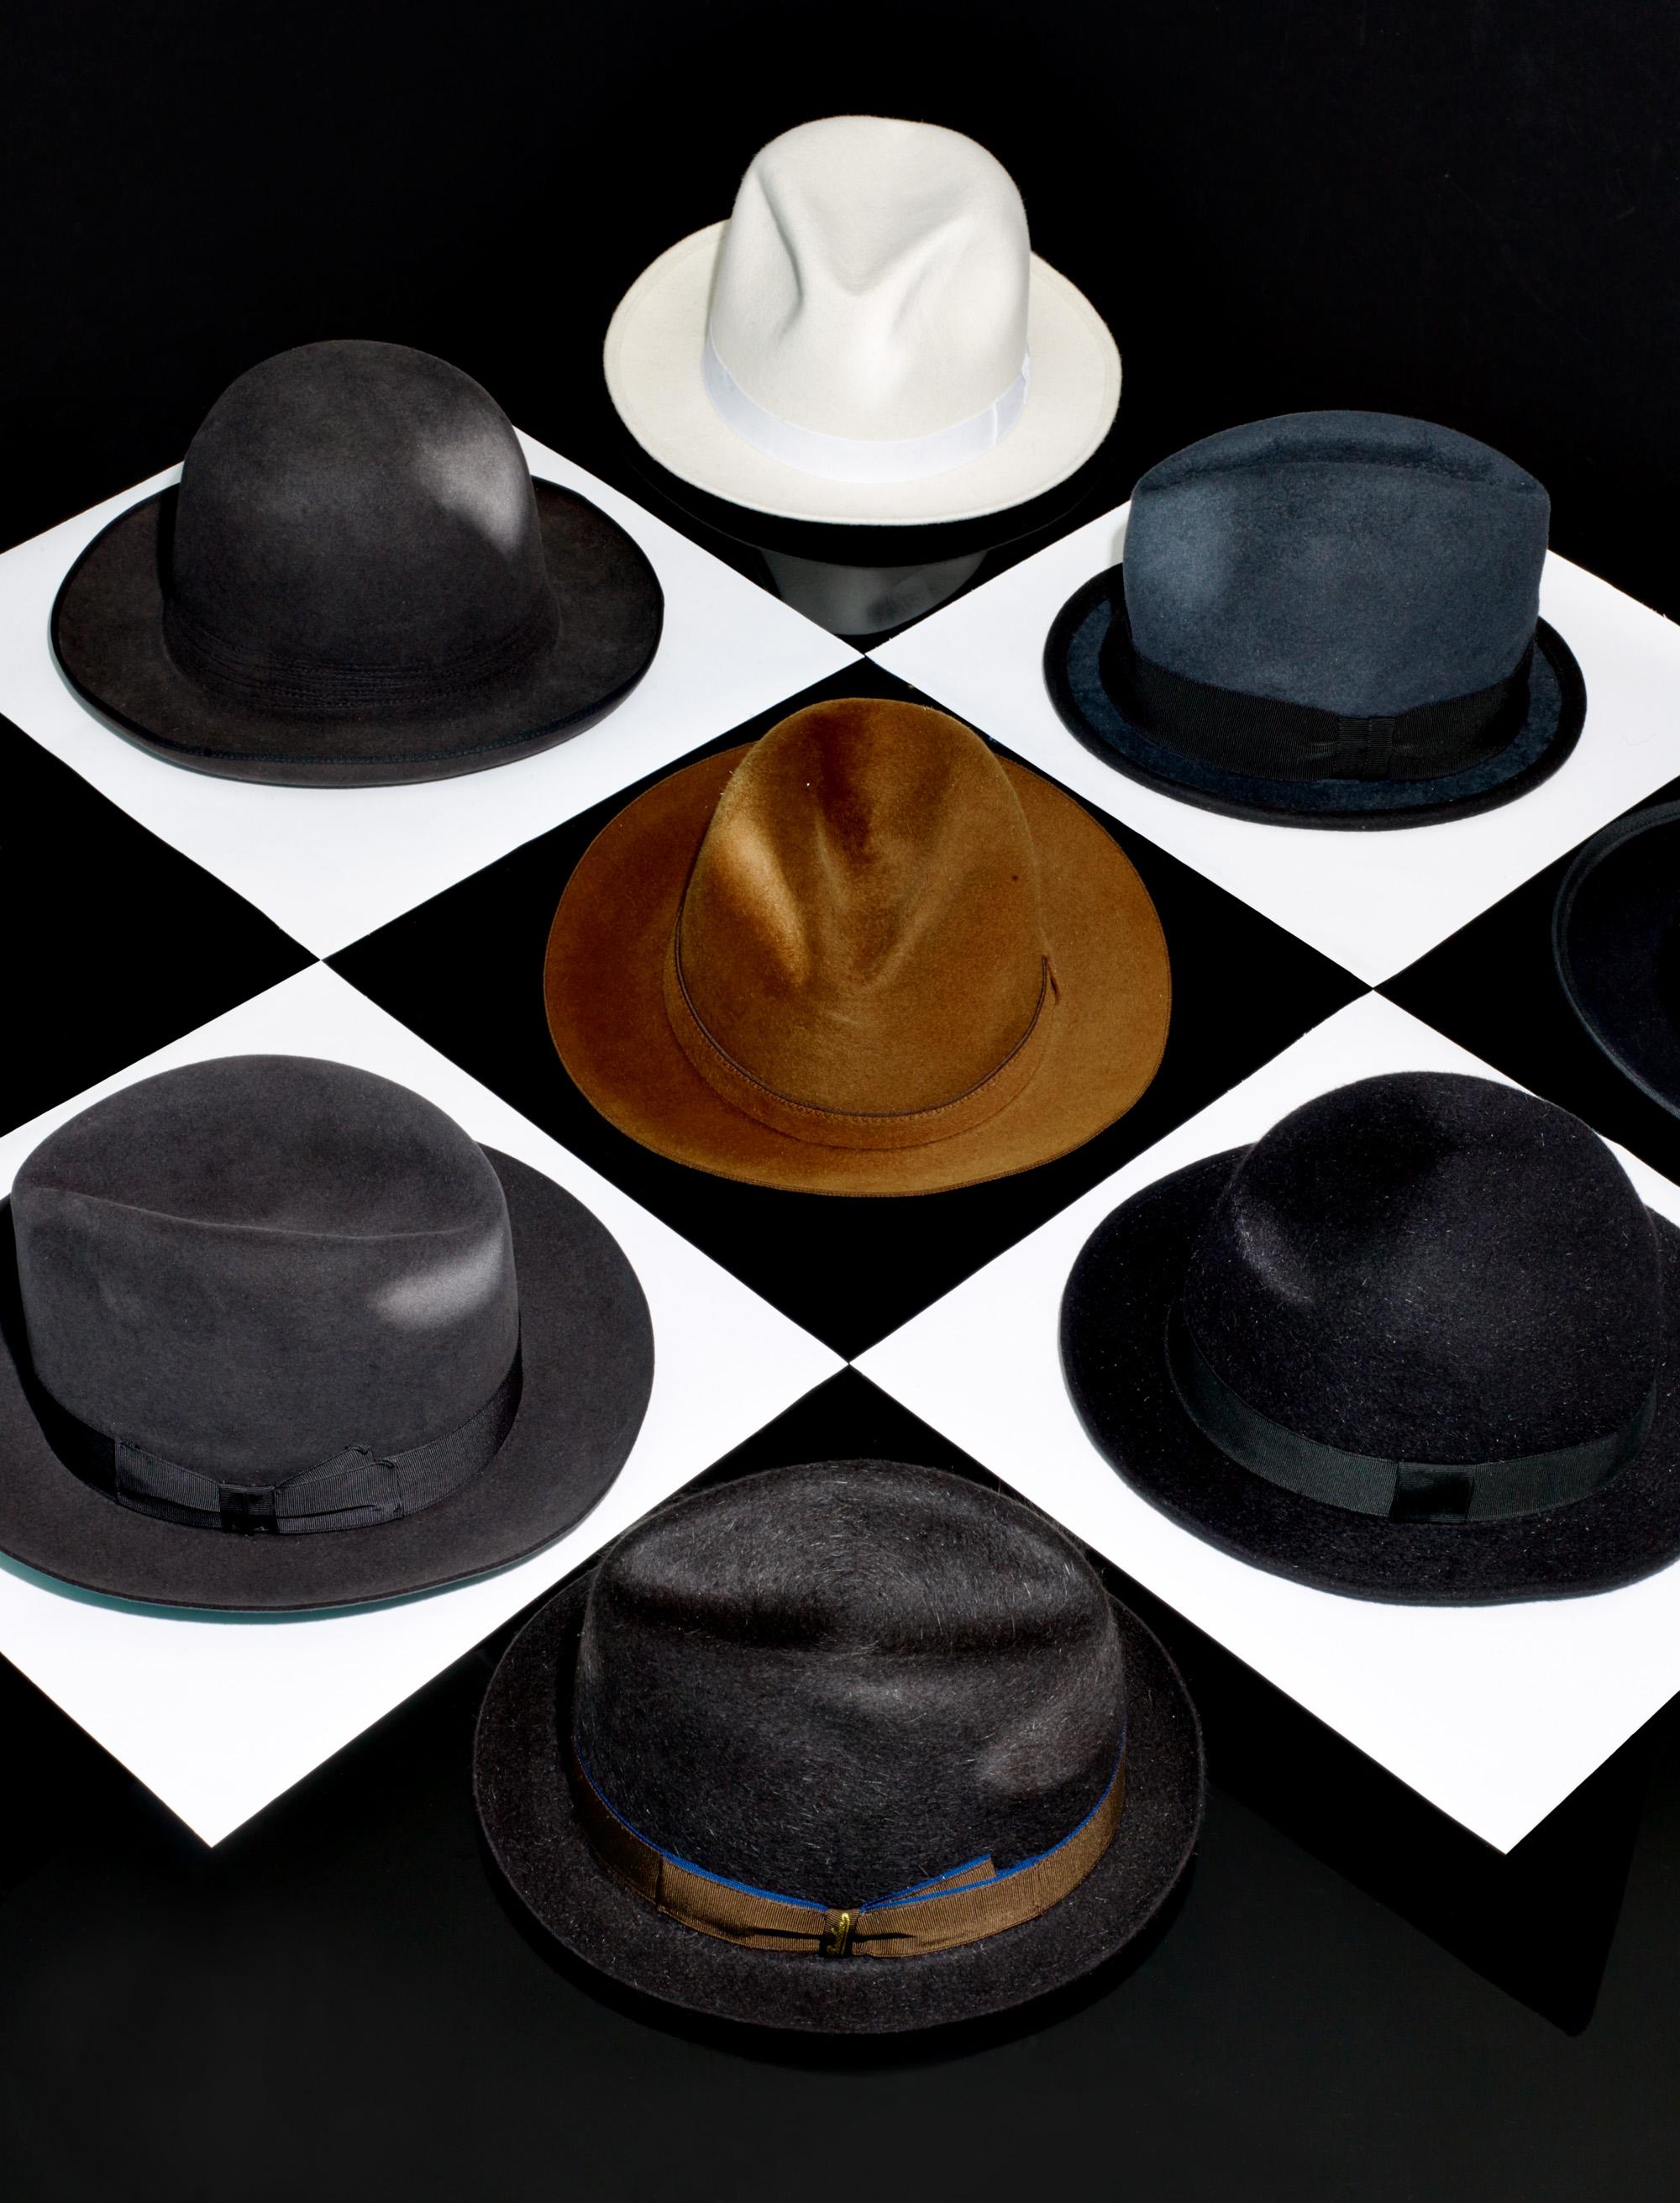 Hats_0374_contrast.jpg